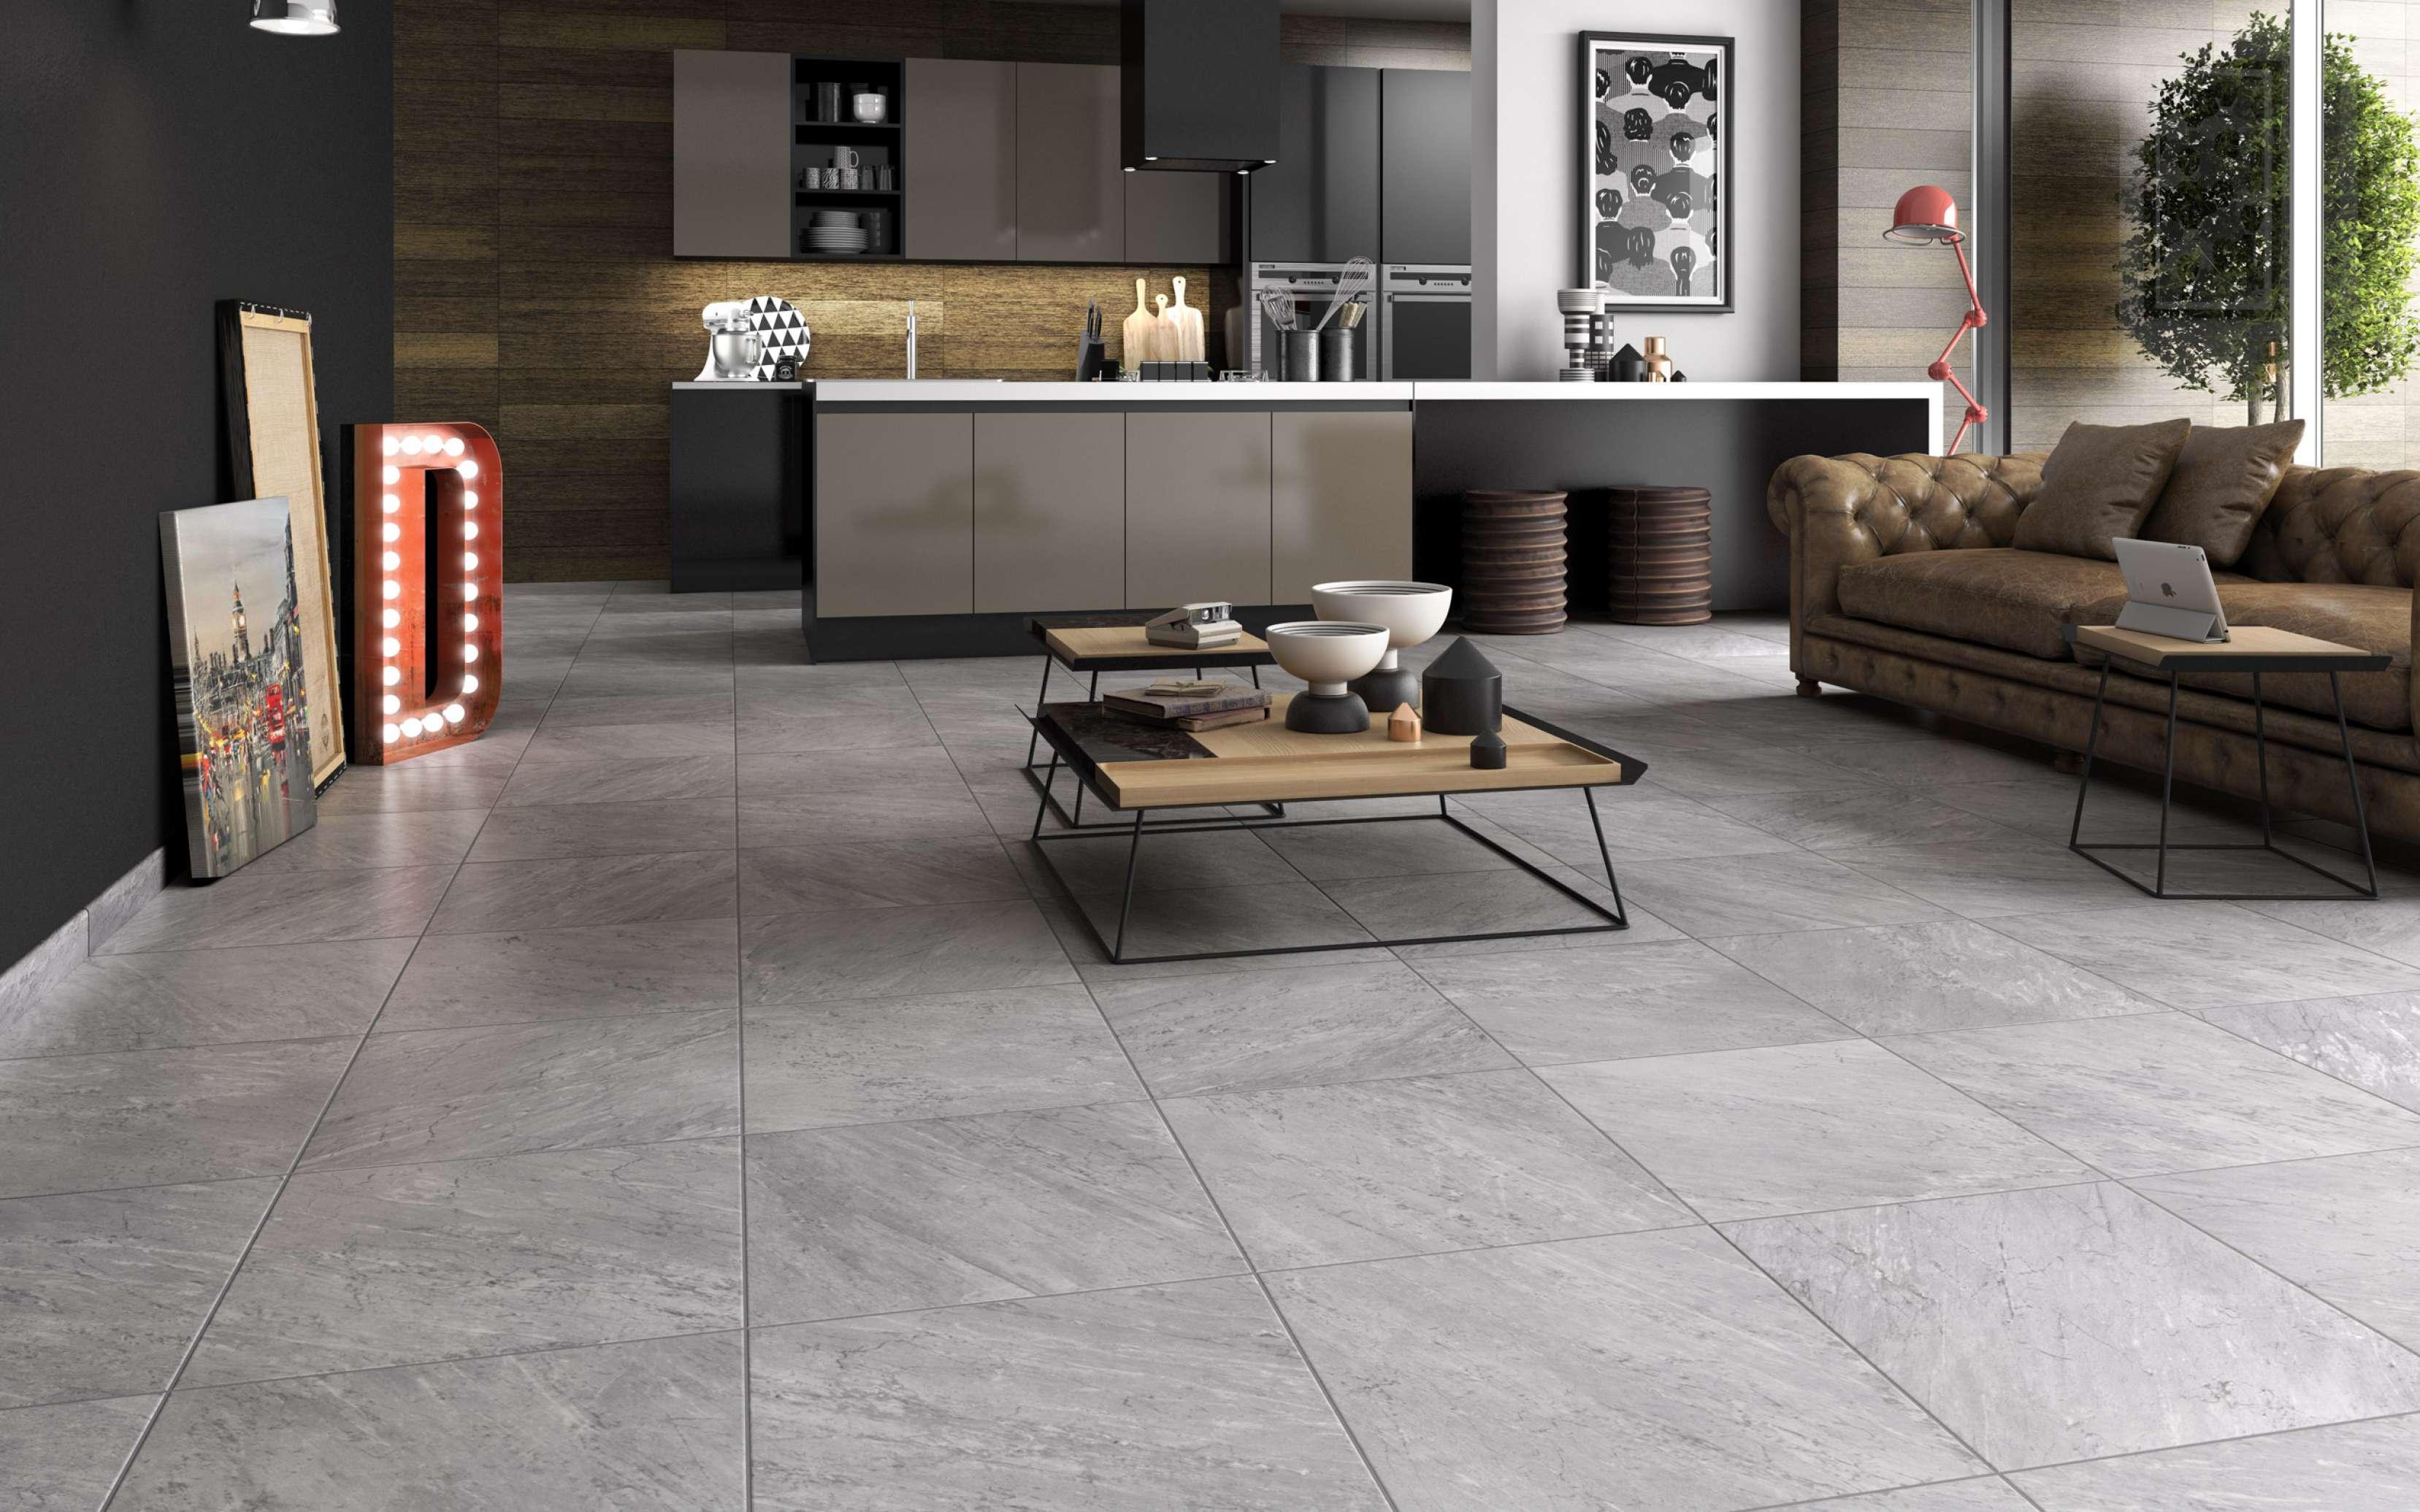 Pavimento exterior barato trendy pavimento exterior for Pavimento ceramico exterior barato